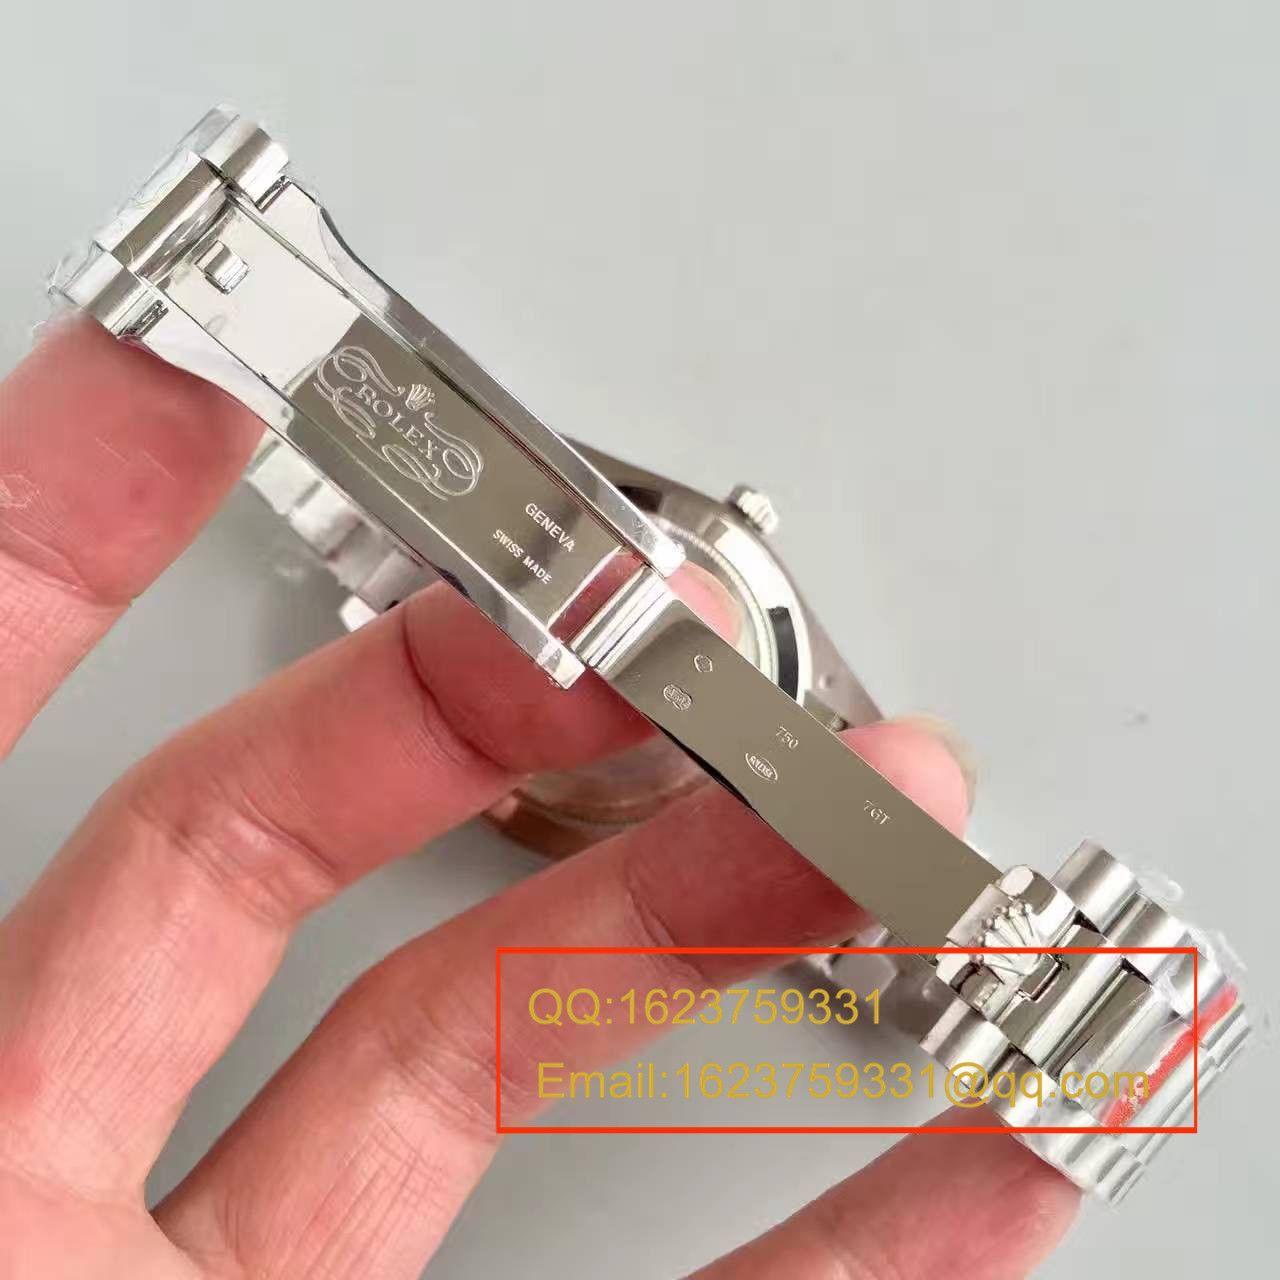 【N厂一比一超A精仿手表】劳力士星期日历型系列228206冰蓝暗纹盘男士机械腕表 / RBE067